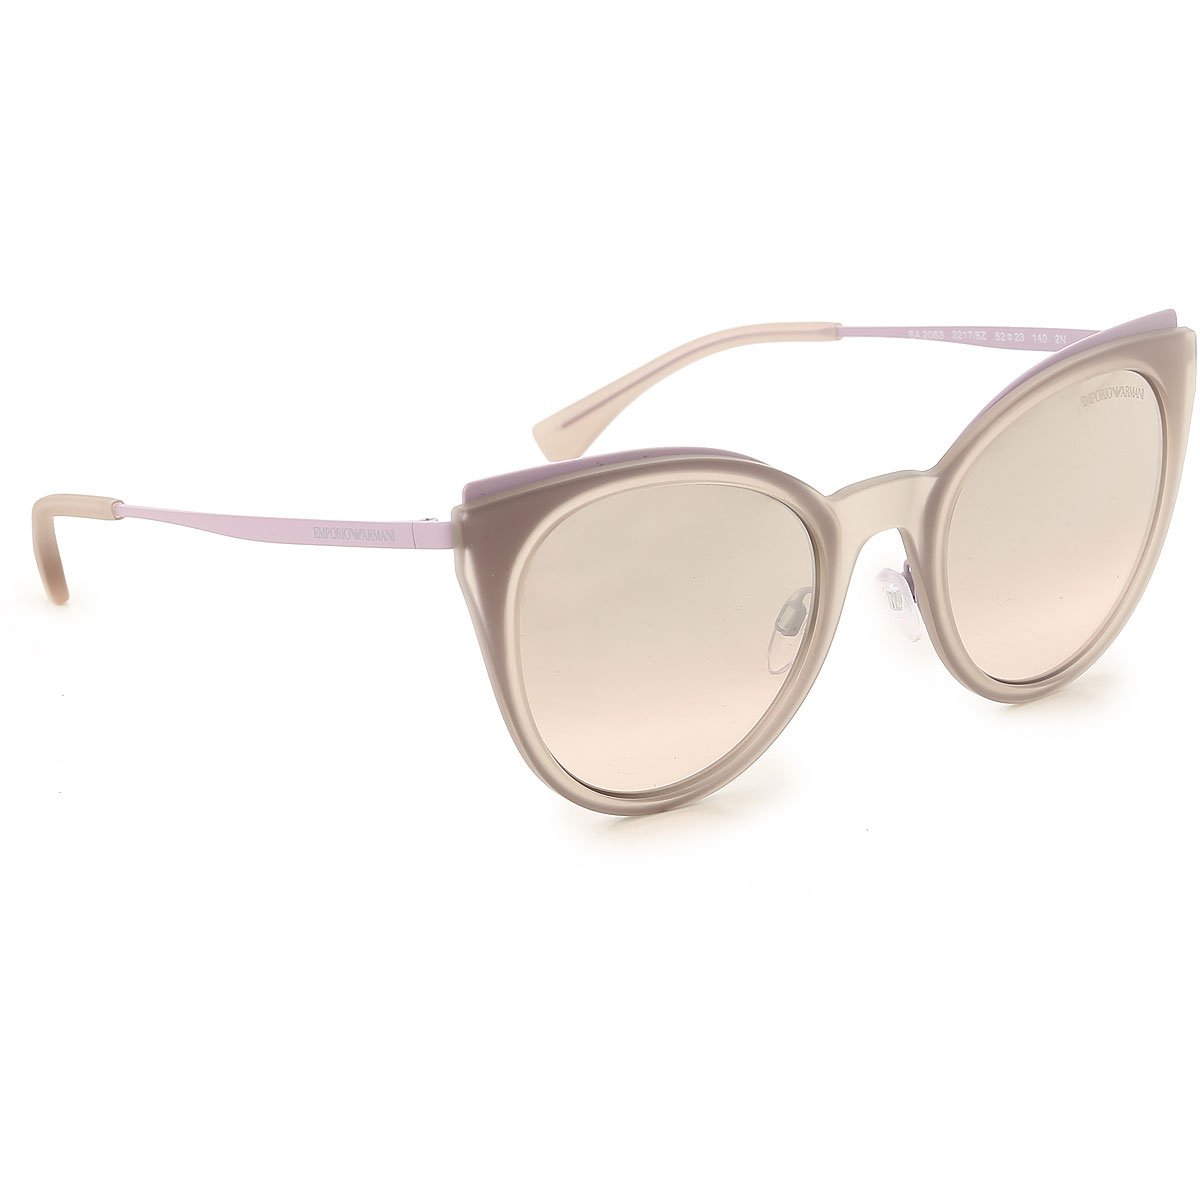 Image of Emporio Armani Sunglasses On Sale, Lilac, 2017